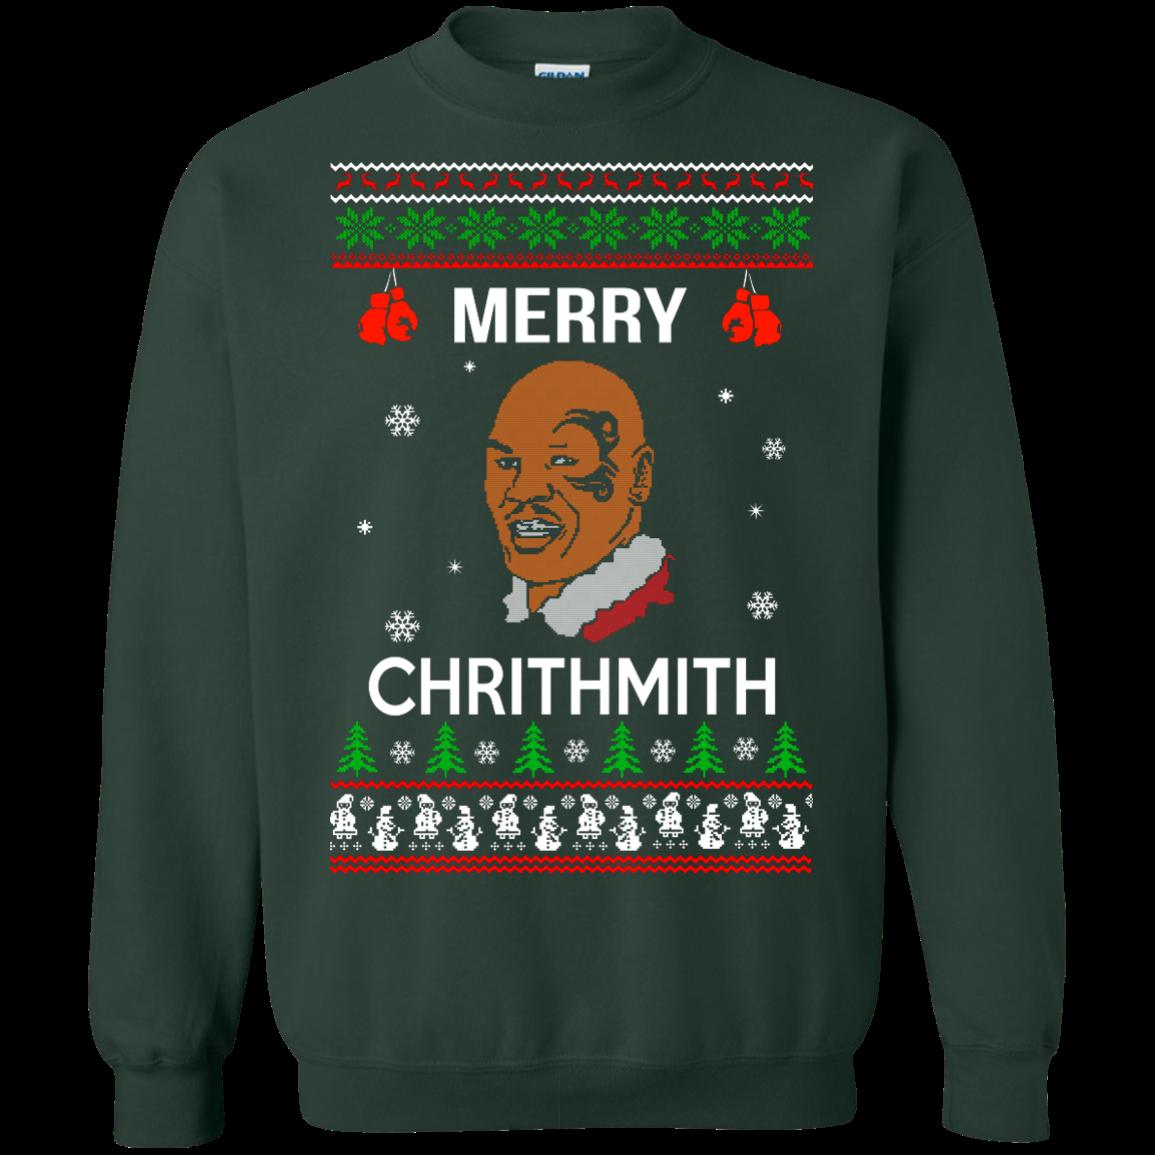 Mike Tyson Merry Chrithmith Christmas Sweater, Long Sleeve Shirt